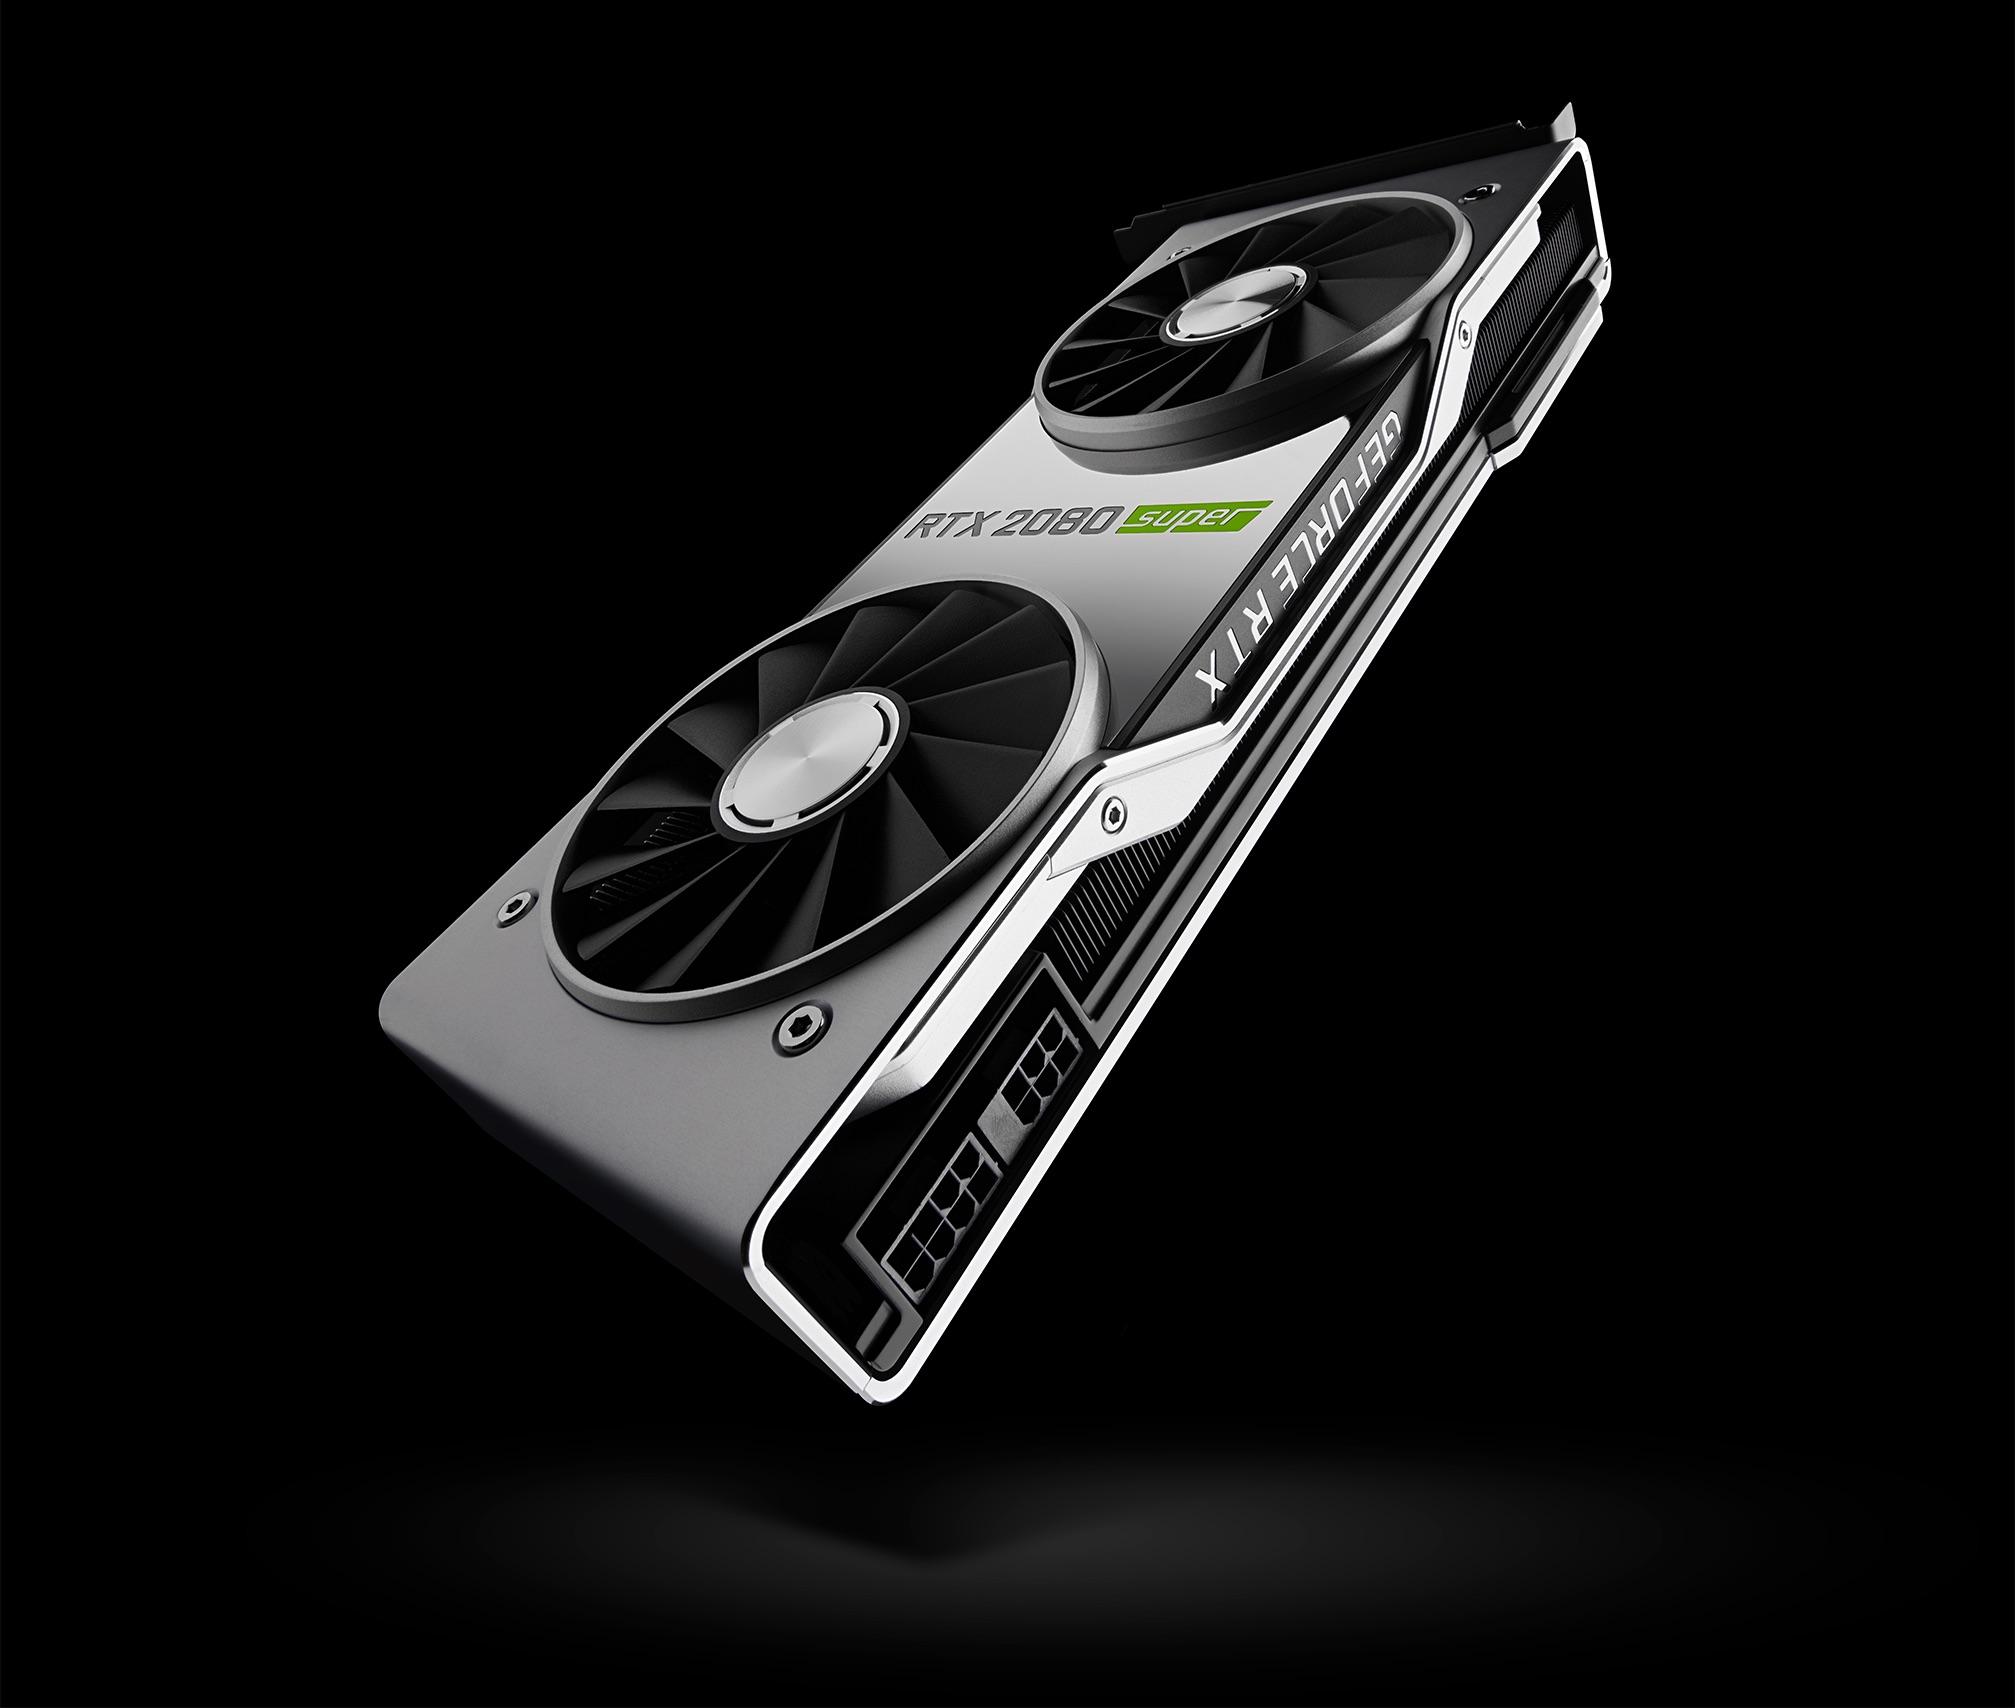 GeForce RTX 2080 Super image